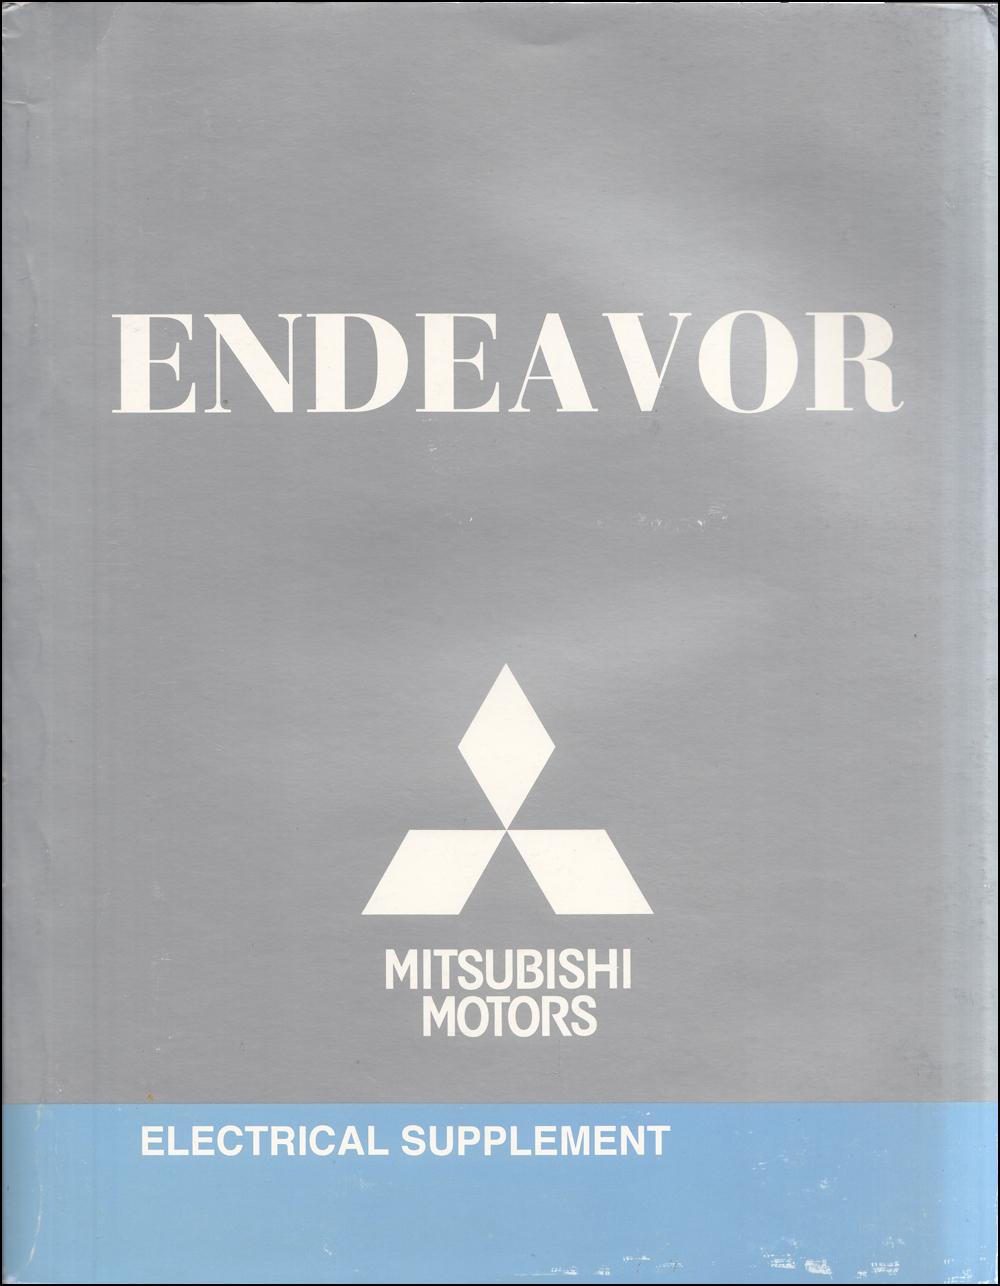 2010 Mitsubishi Endeavor Wiring Diagram Manual Original